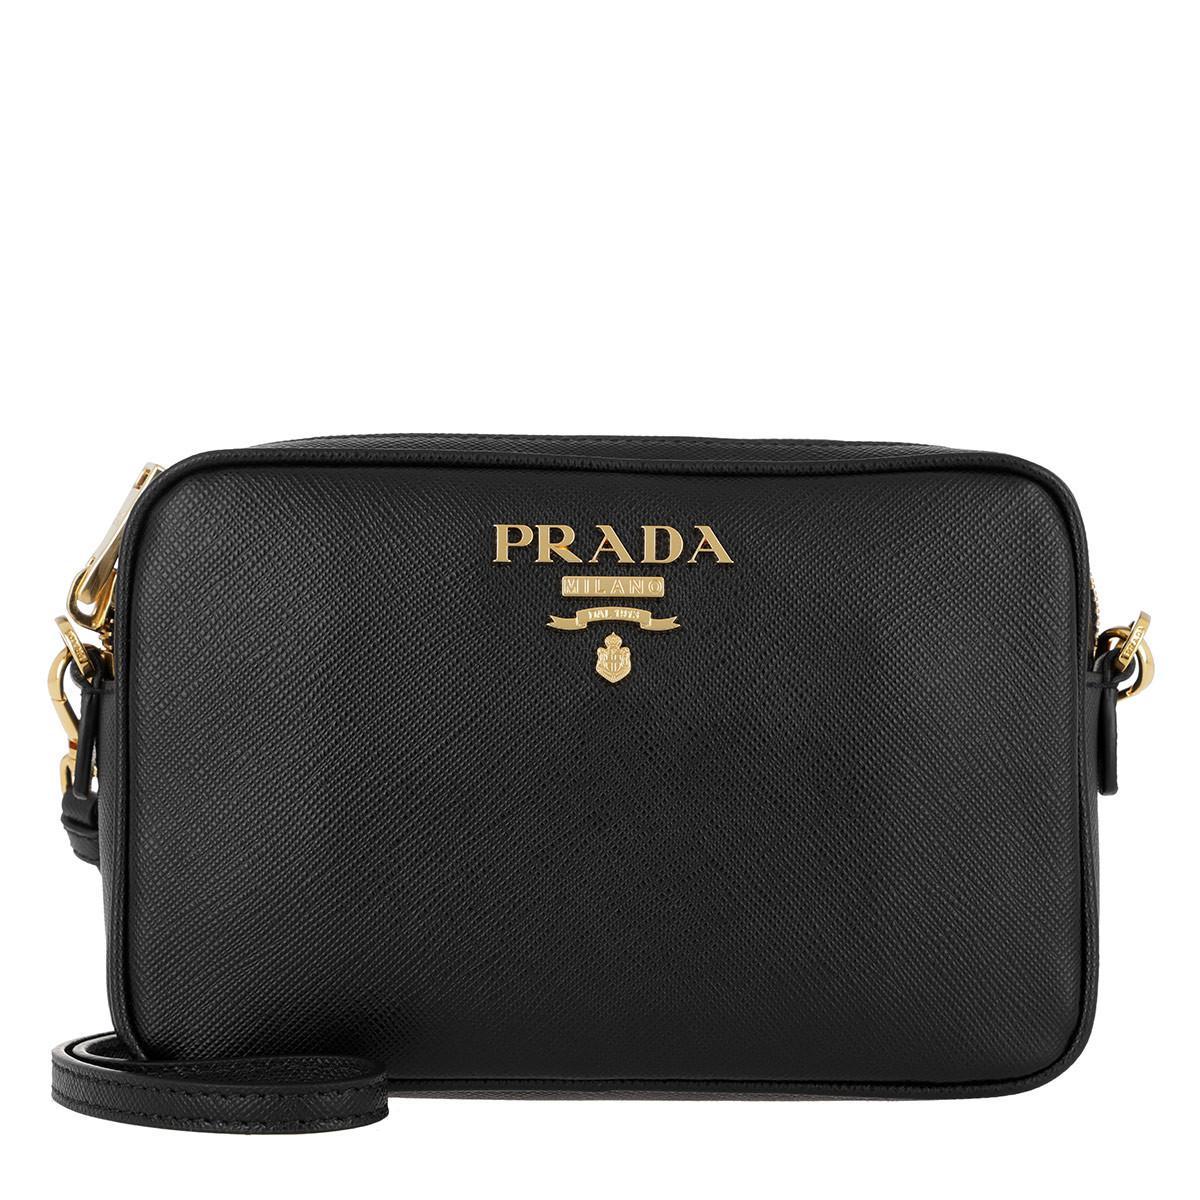 Cross Body Bags - Calf Leather Crossbody Multistrap Black - black - Cross Body Bags for ladies Prada Vnxe8Rs7